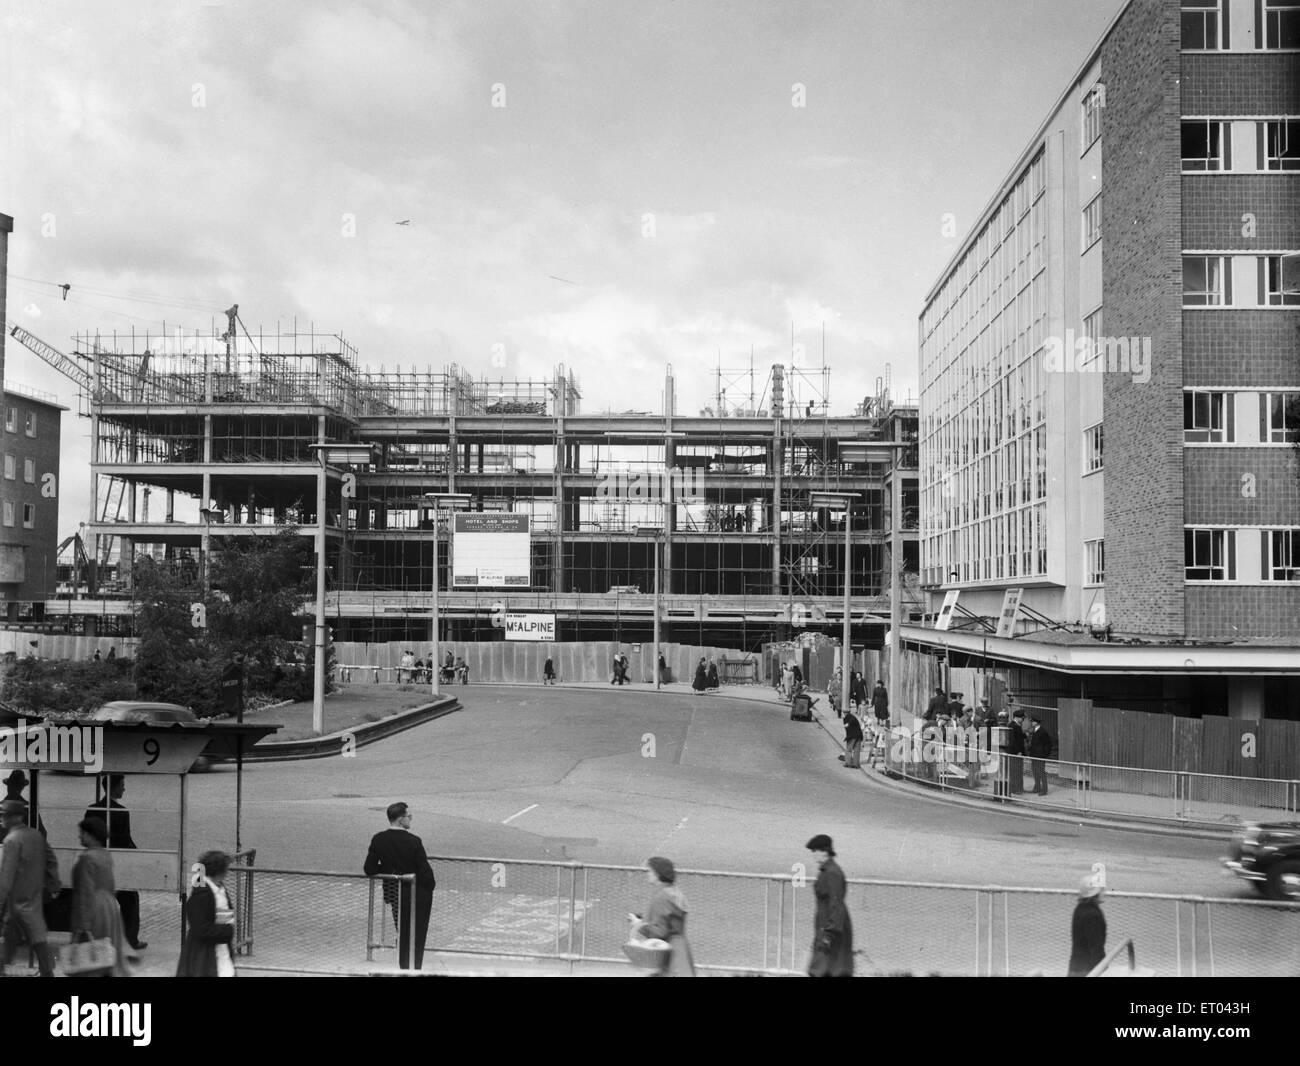 Broadgate under construction circa 1954 - Stock Image